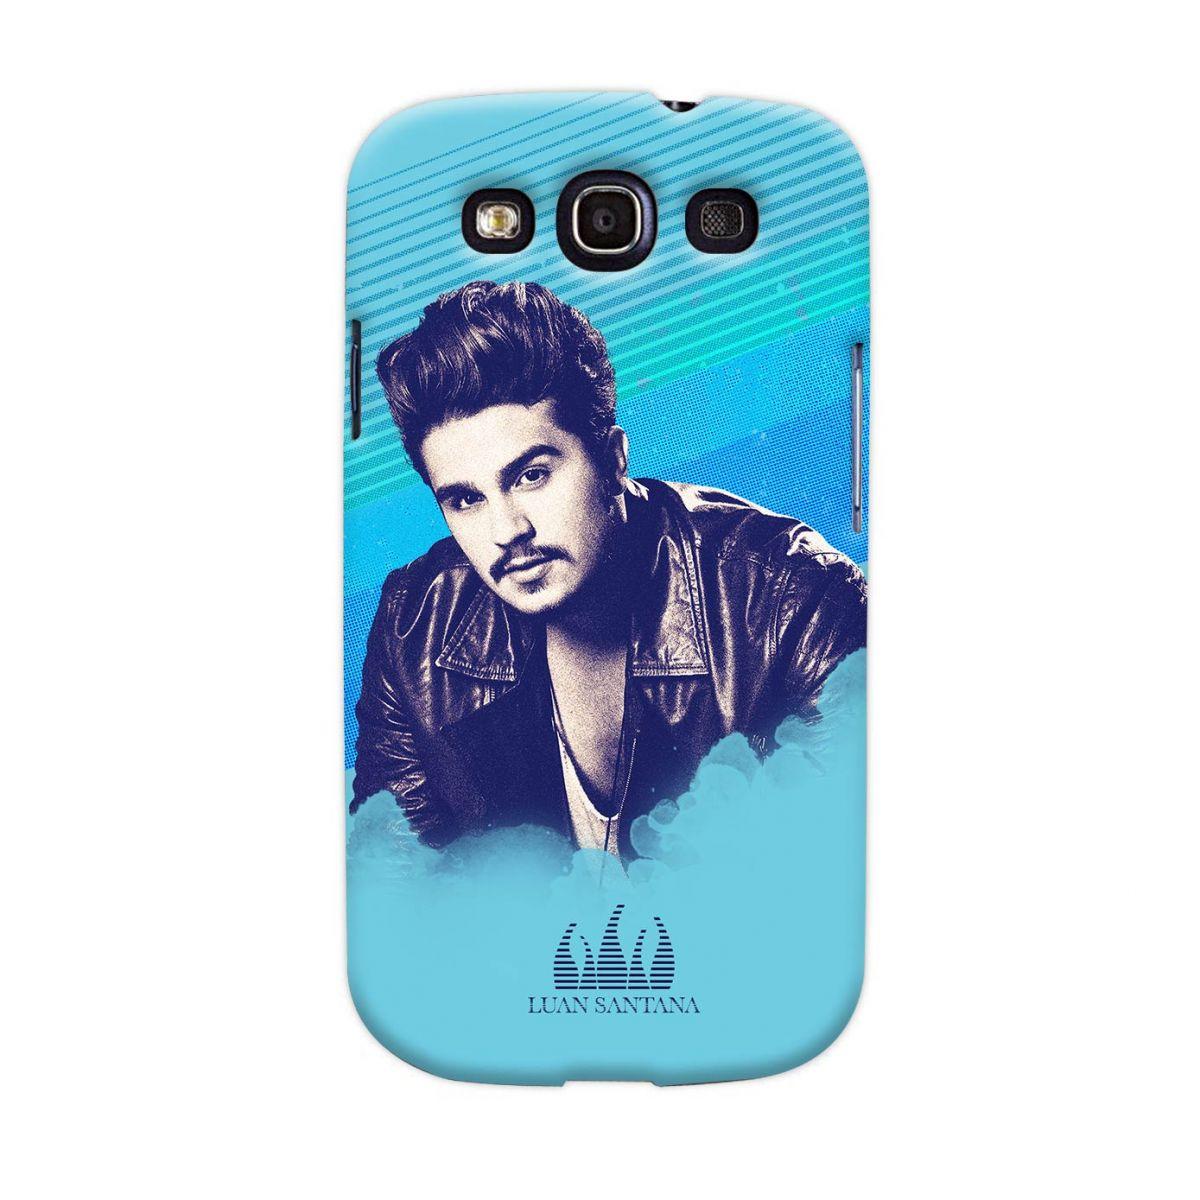 Capa de Celular Samsung Galaxy S3 Luan Santana Sky